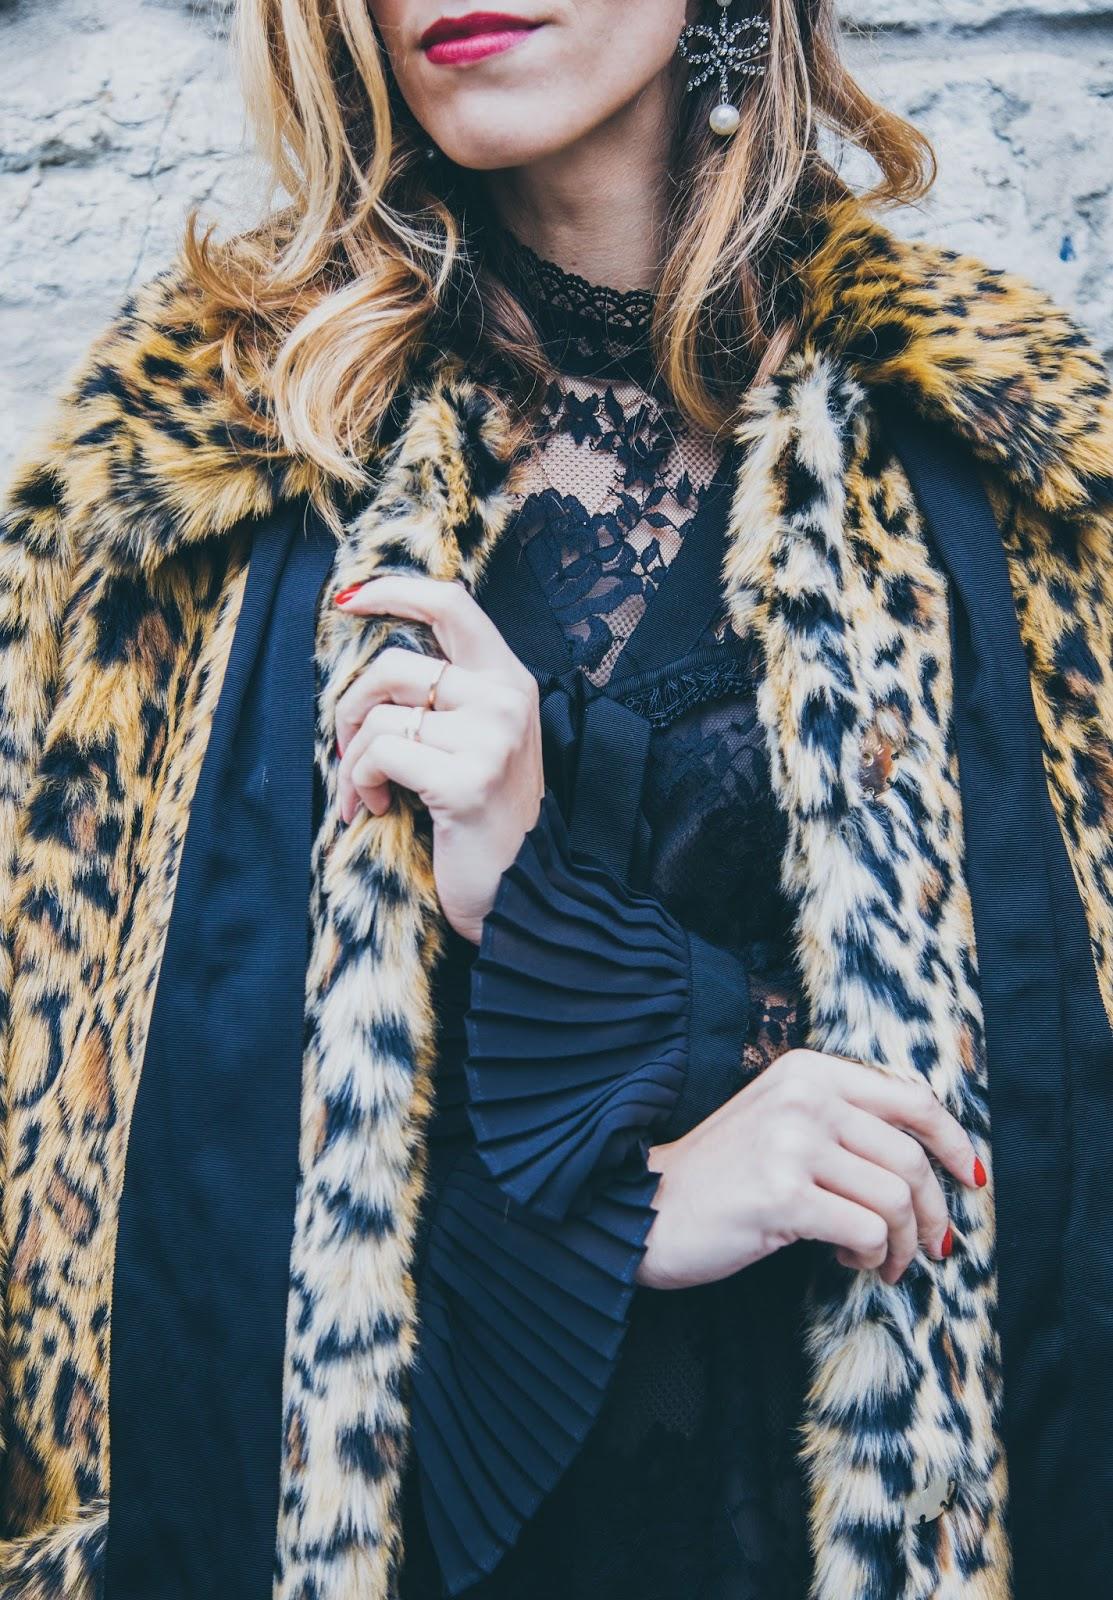 erdem x hm collaboration collection leopard coat earrings